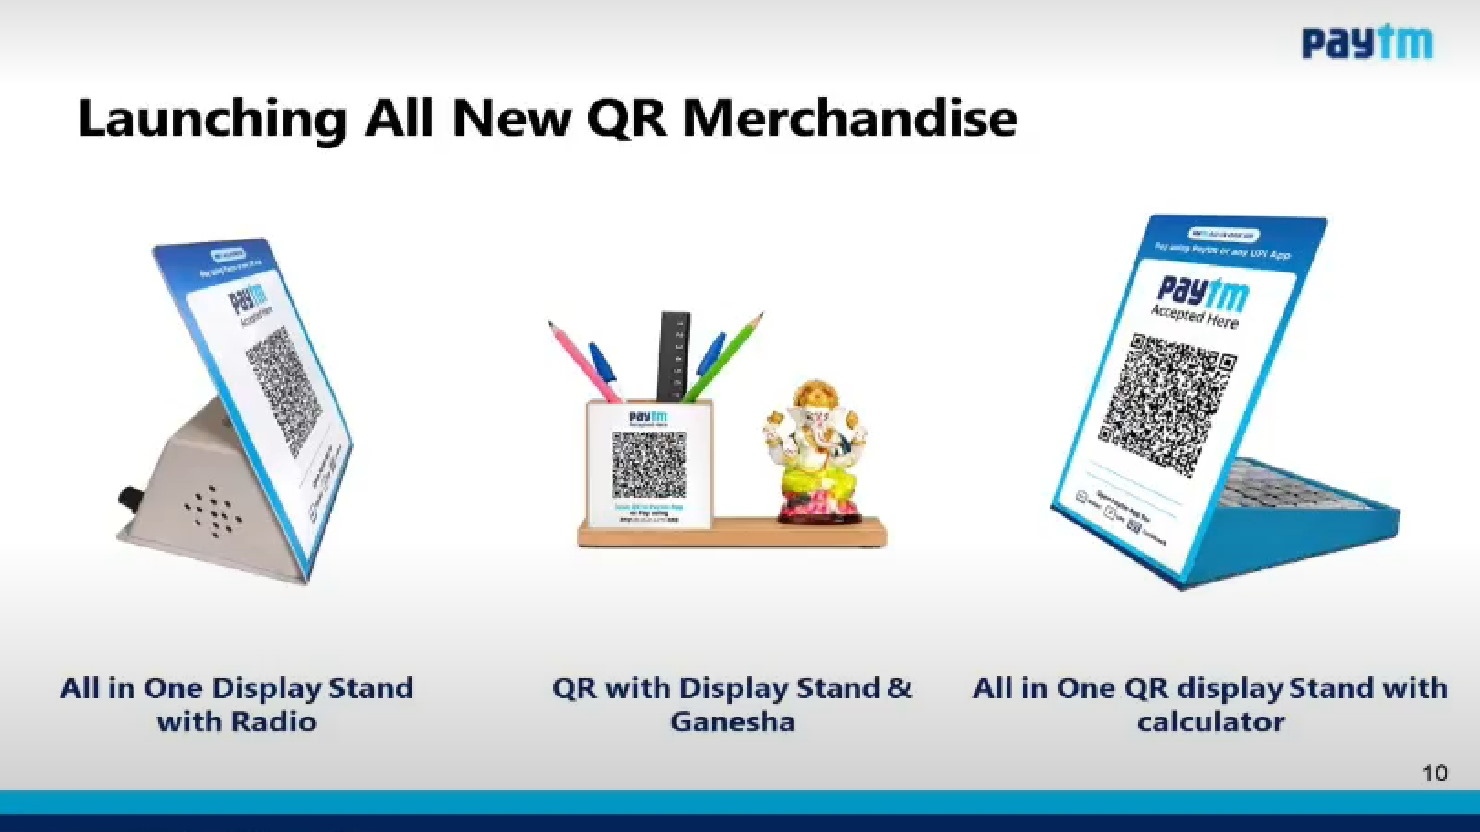 paytm QR merchandise – 1